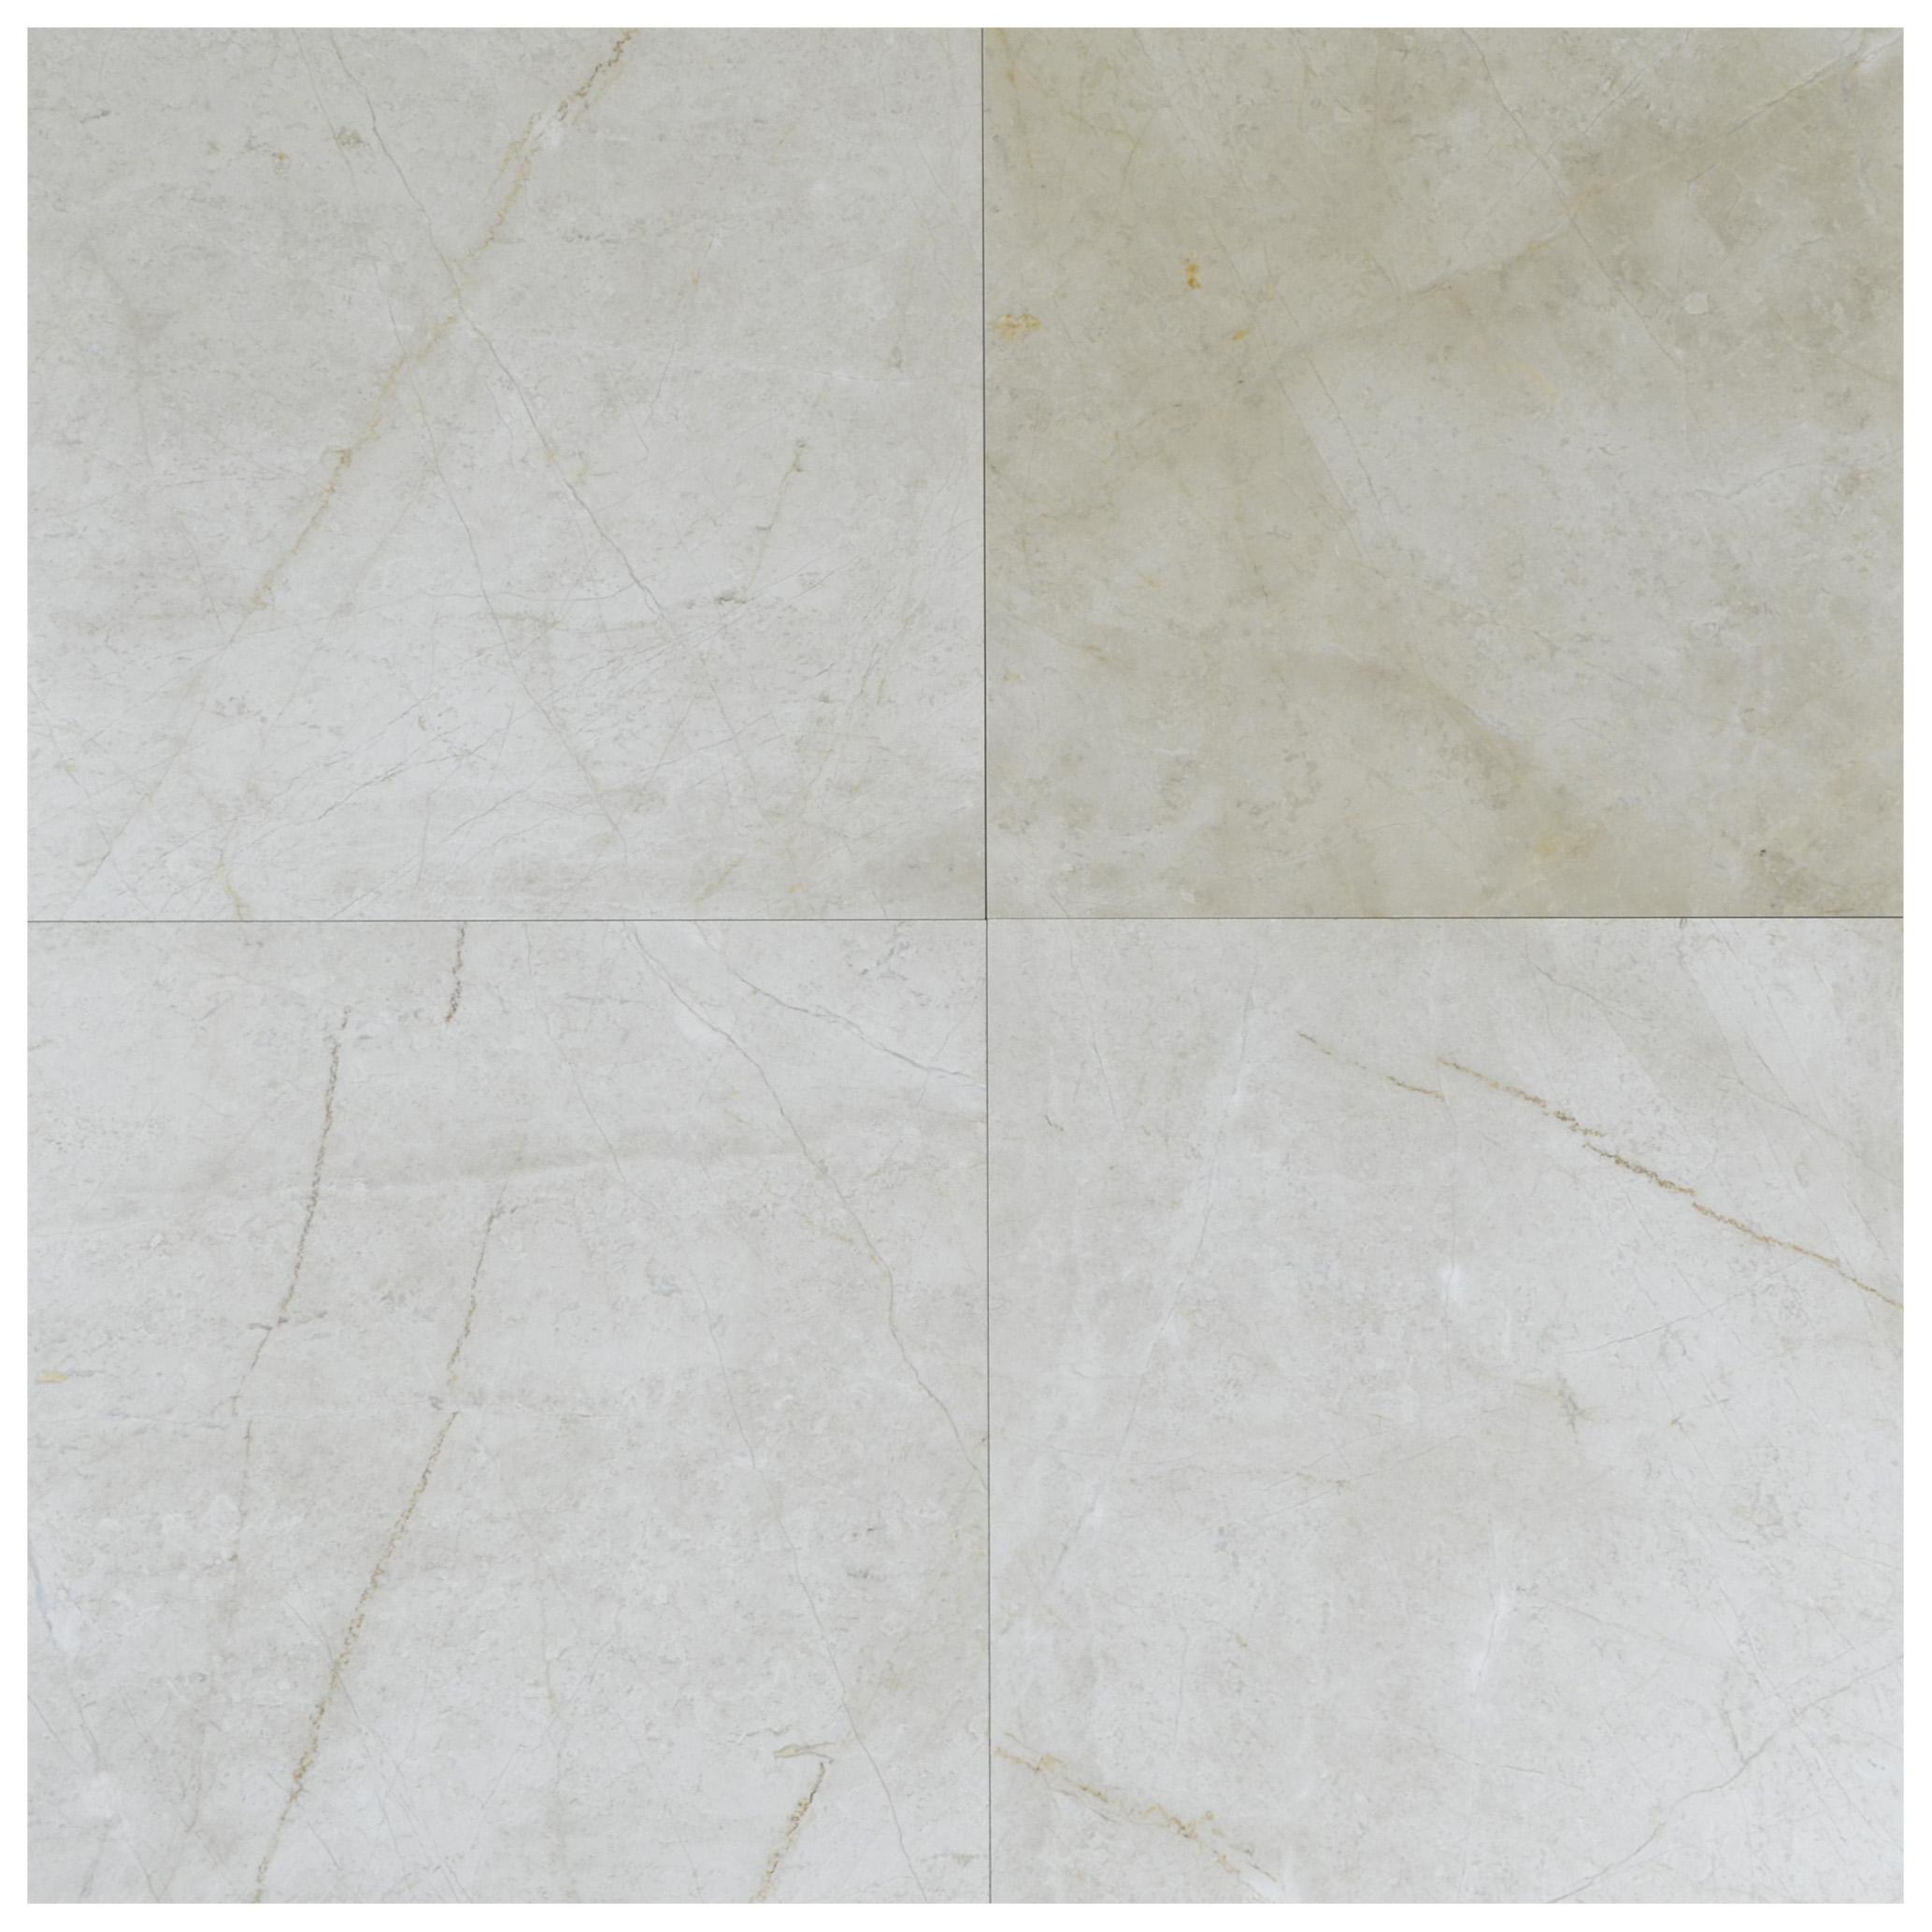 Cream Nouva Polished Marble Tiles 35x35-marble sale-Atlantic Stone Source